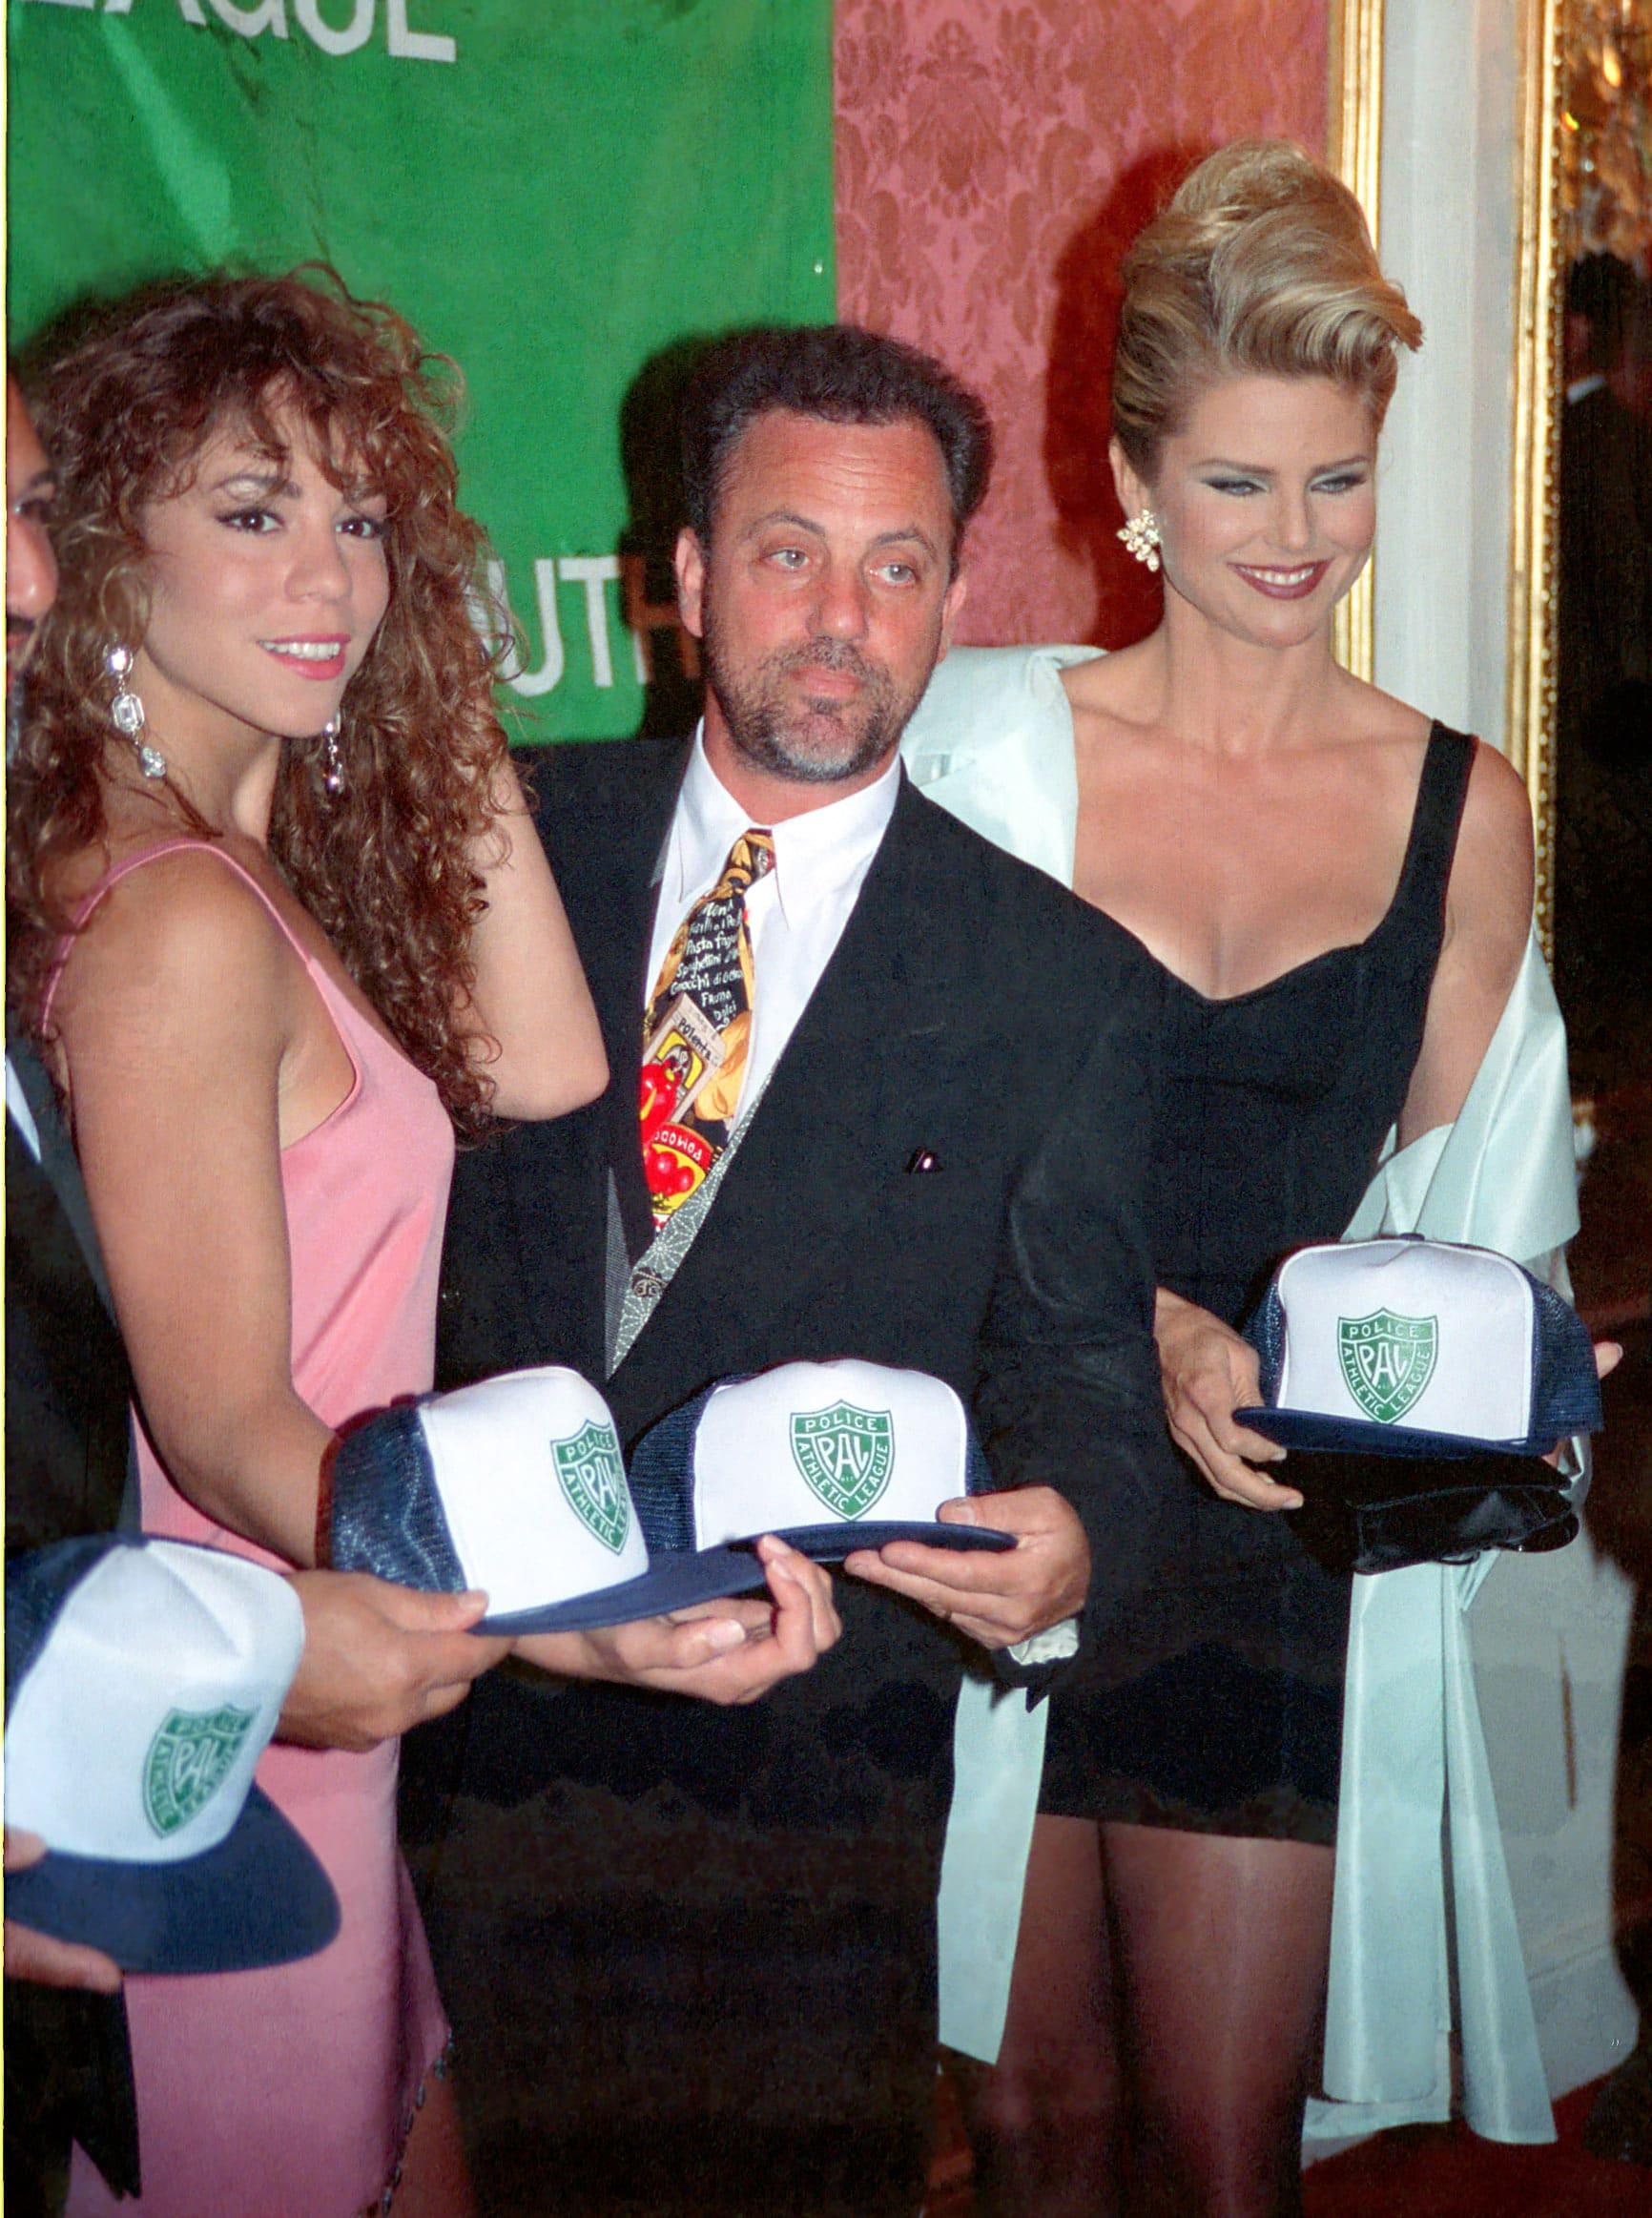 NEW YORK, CIRCA 1995: MARIAH CAREY, BILLY JOEL, CHRISTIE BRINKLEY